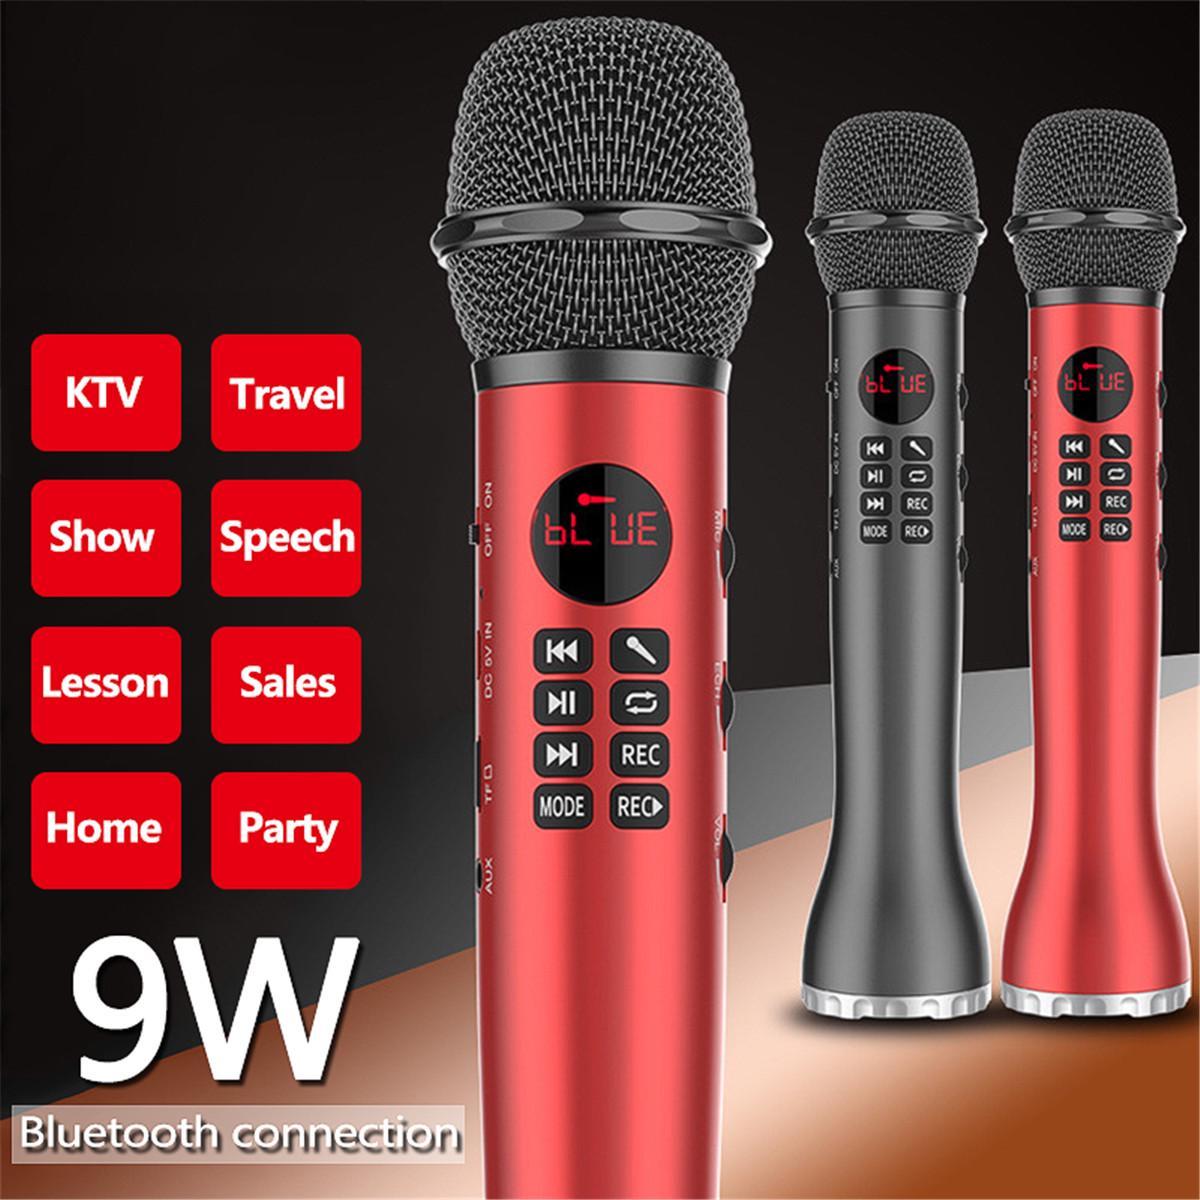 9W 2000Mah Portable Wireless Bluetooth Microphone Speaker Record Card Karaoke Handheld Microphones